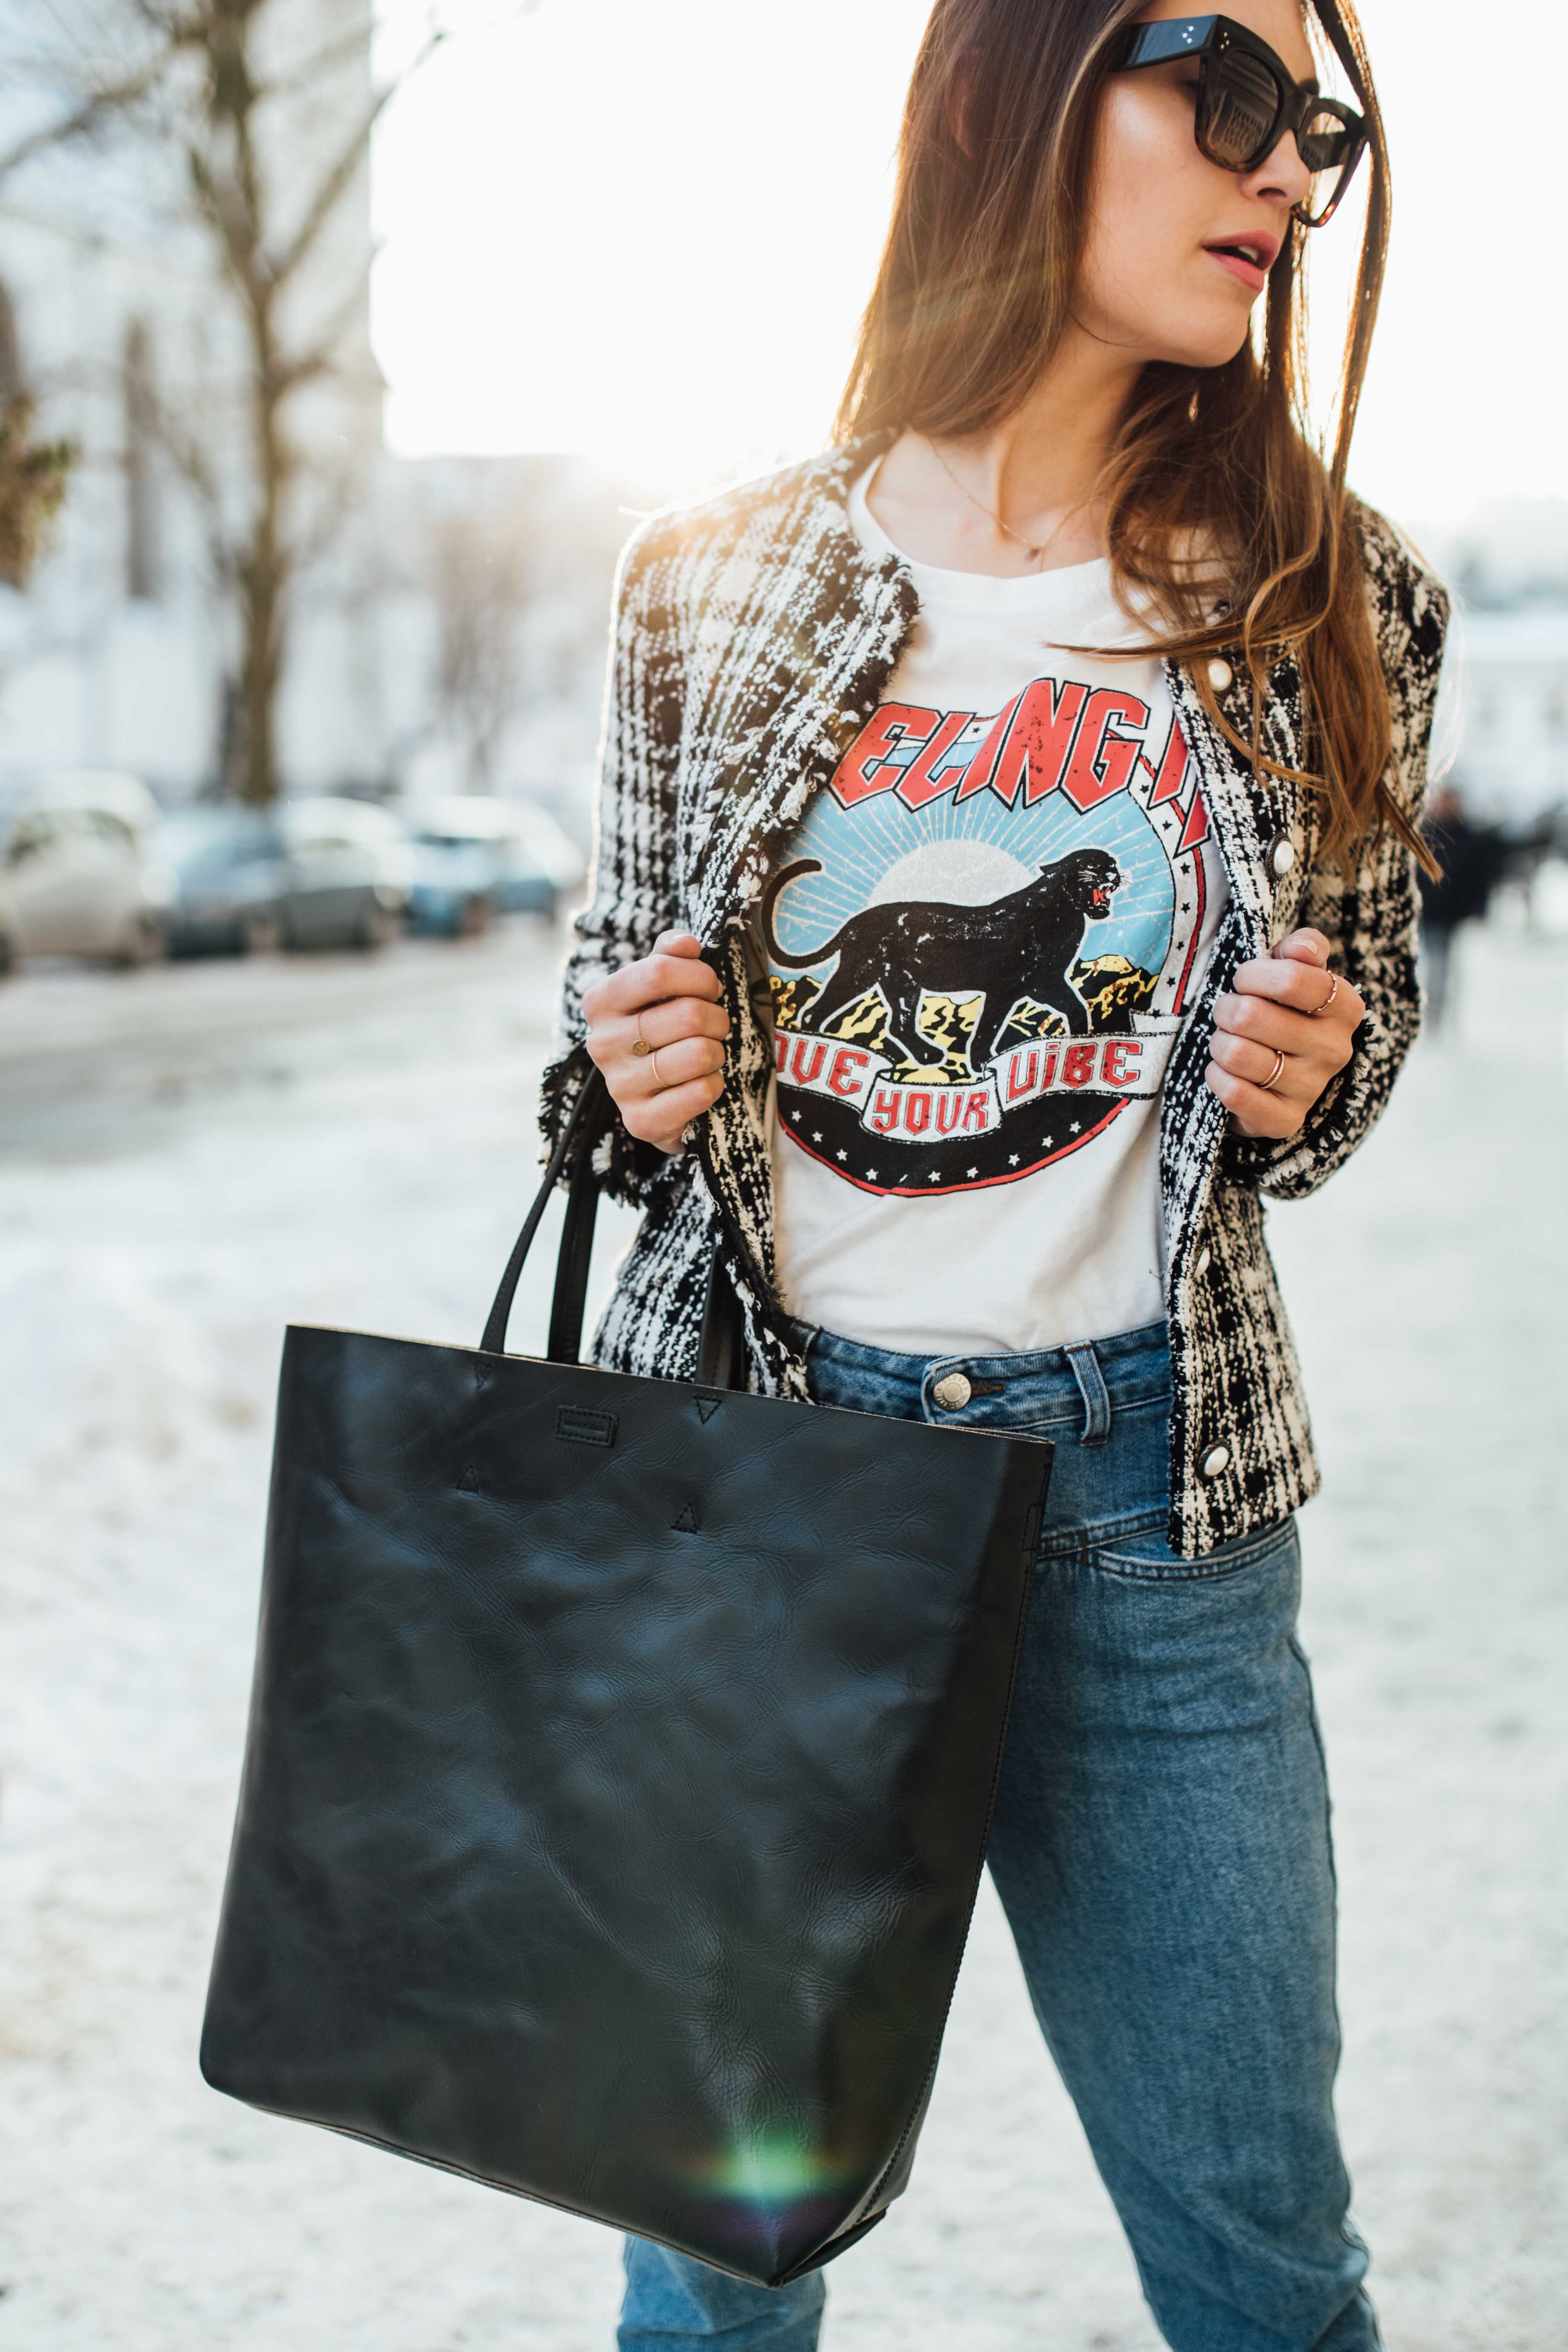 OUTFIT: Marc O'Polo 50'Bag, Céline Catherine Sunglasses, Closed Jeans, Zara Blazer, H&M Band T-Shirt | You rock my life by Nina Wro